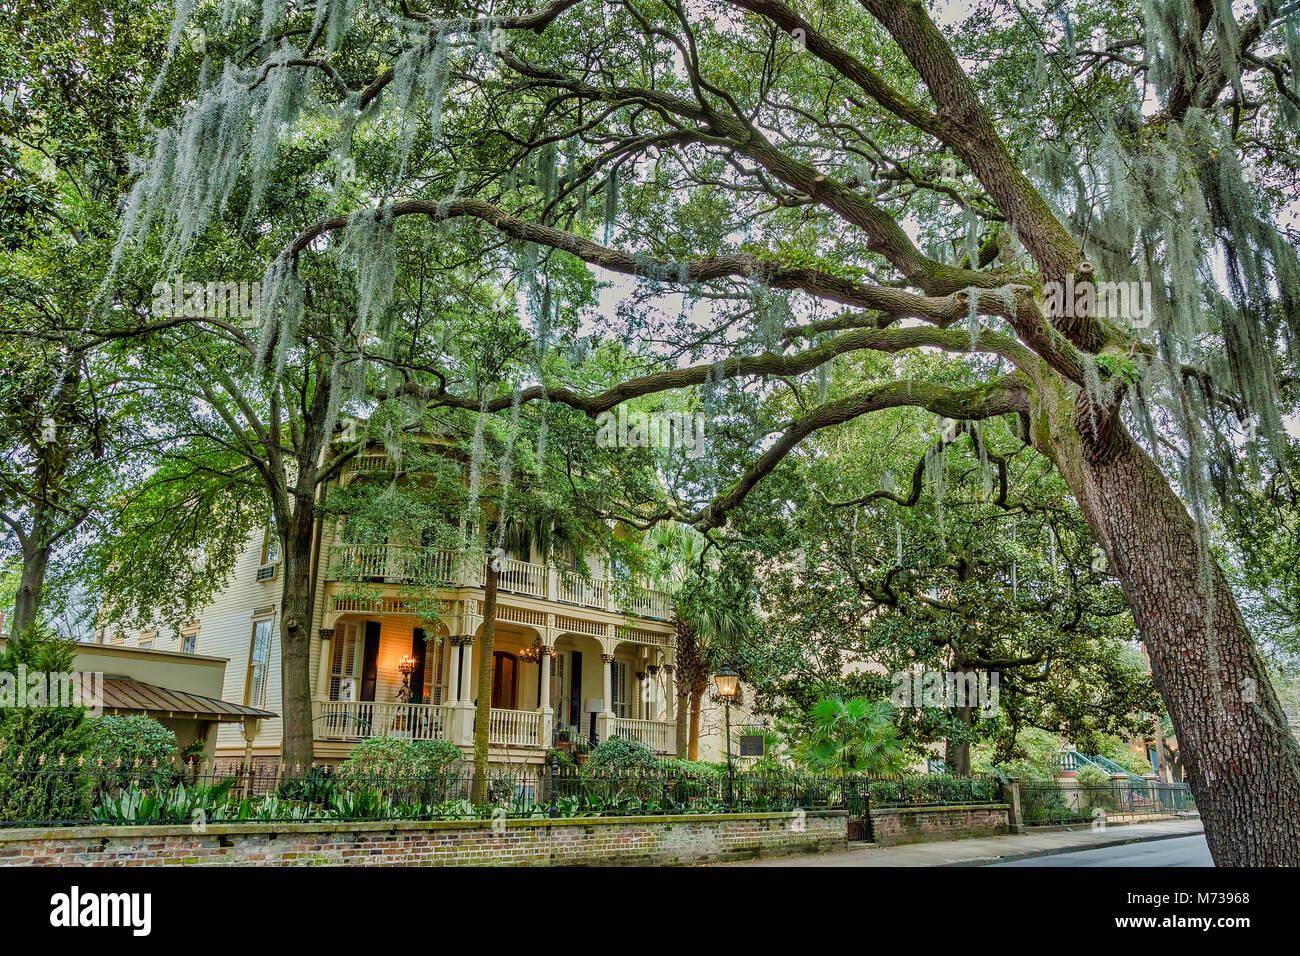 Magnolia hall building in Savannah, Georgia - Stock Image